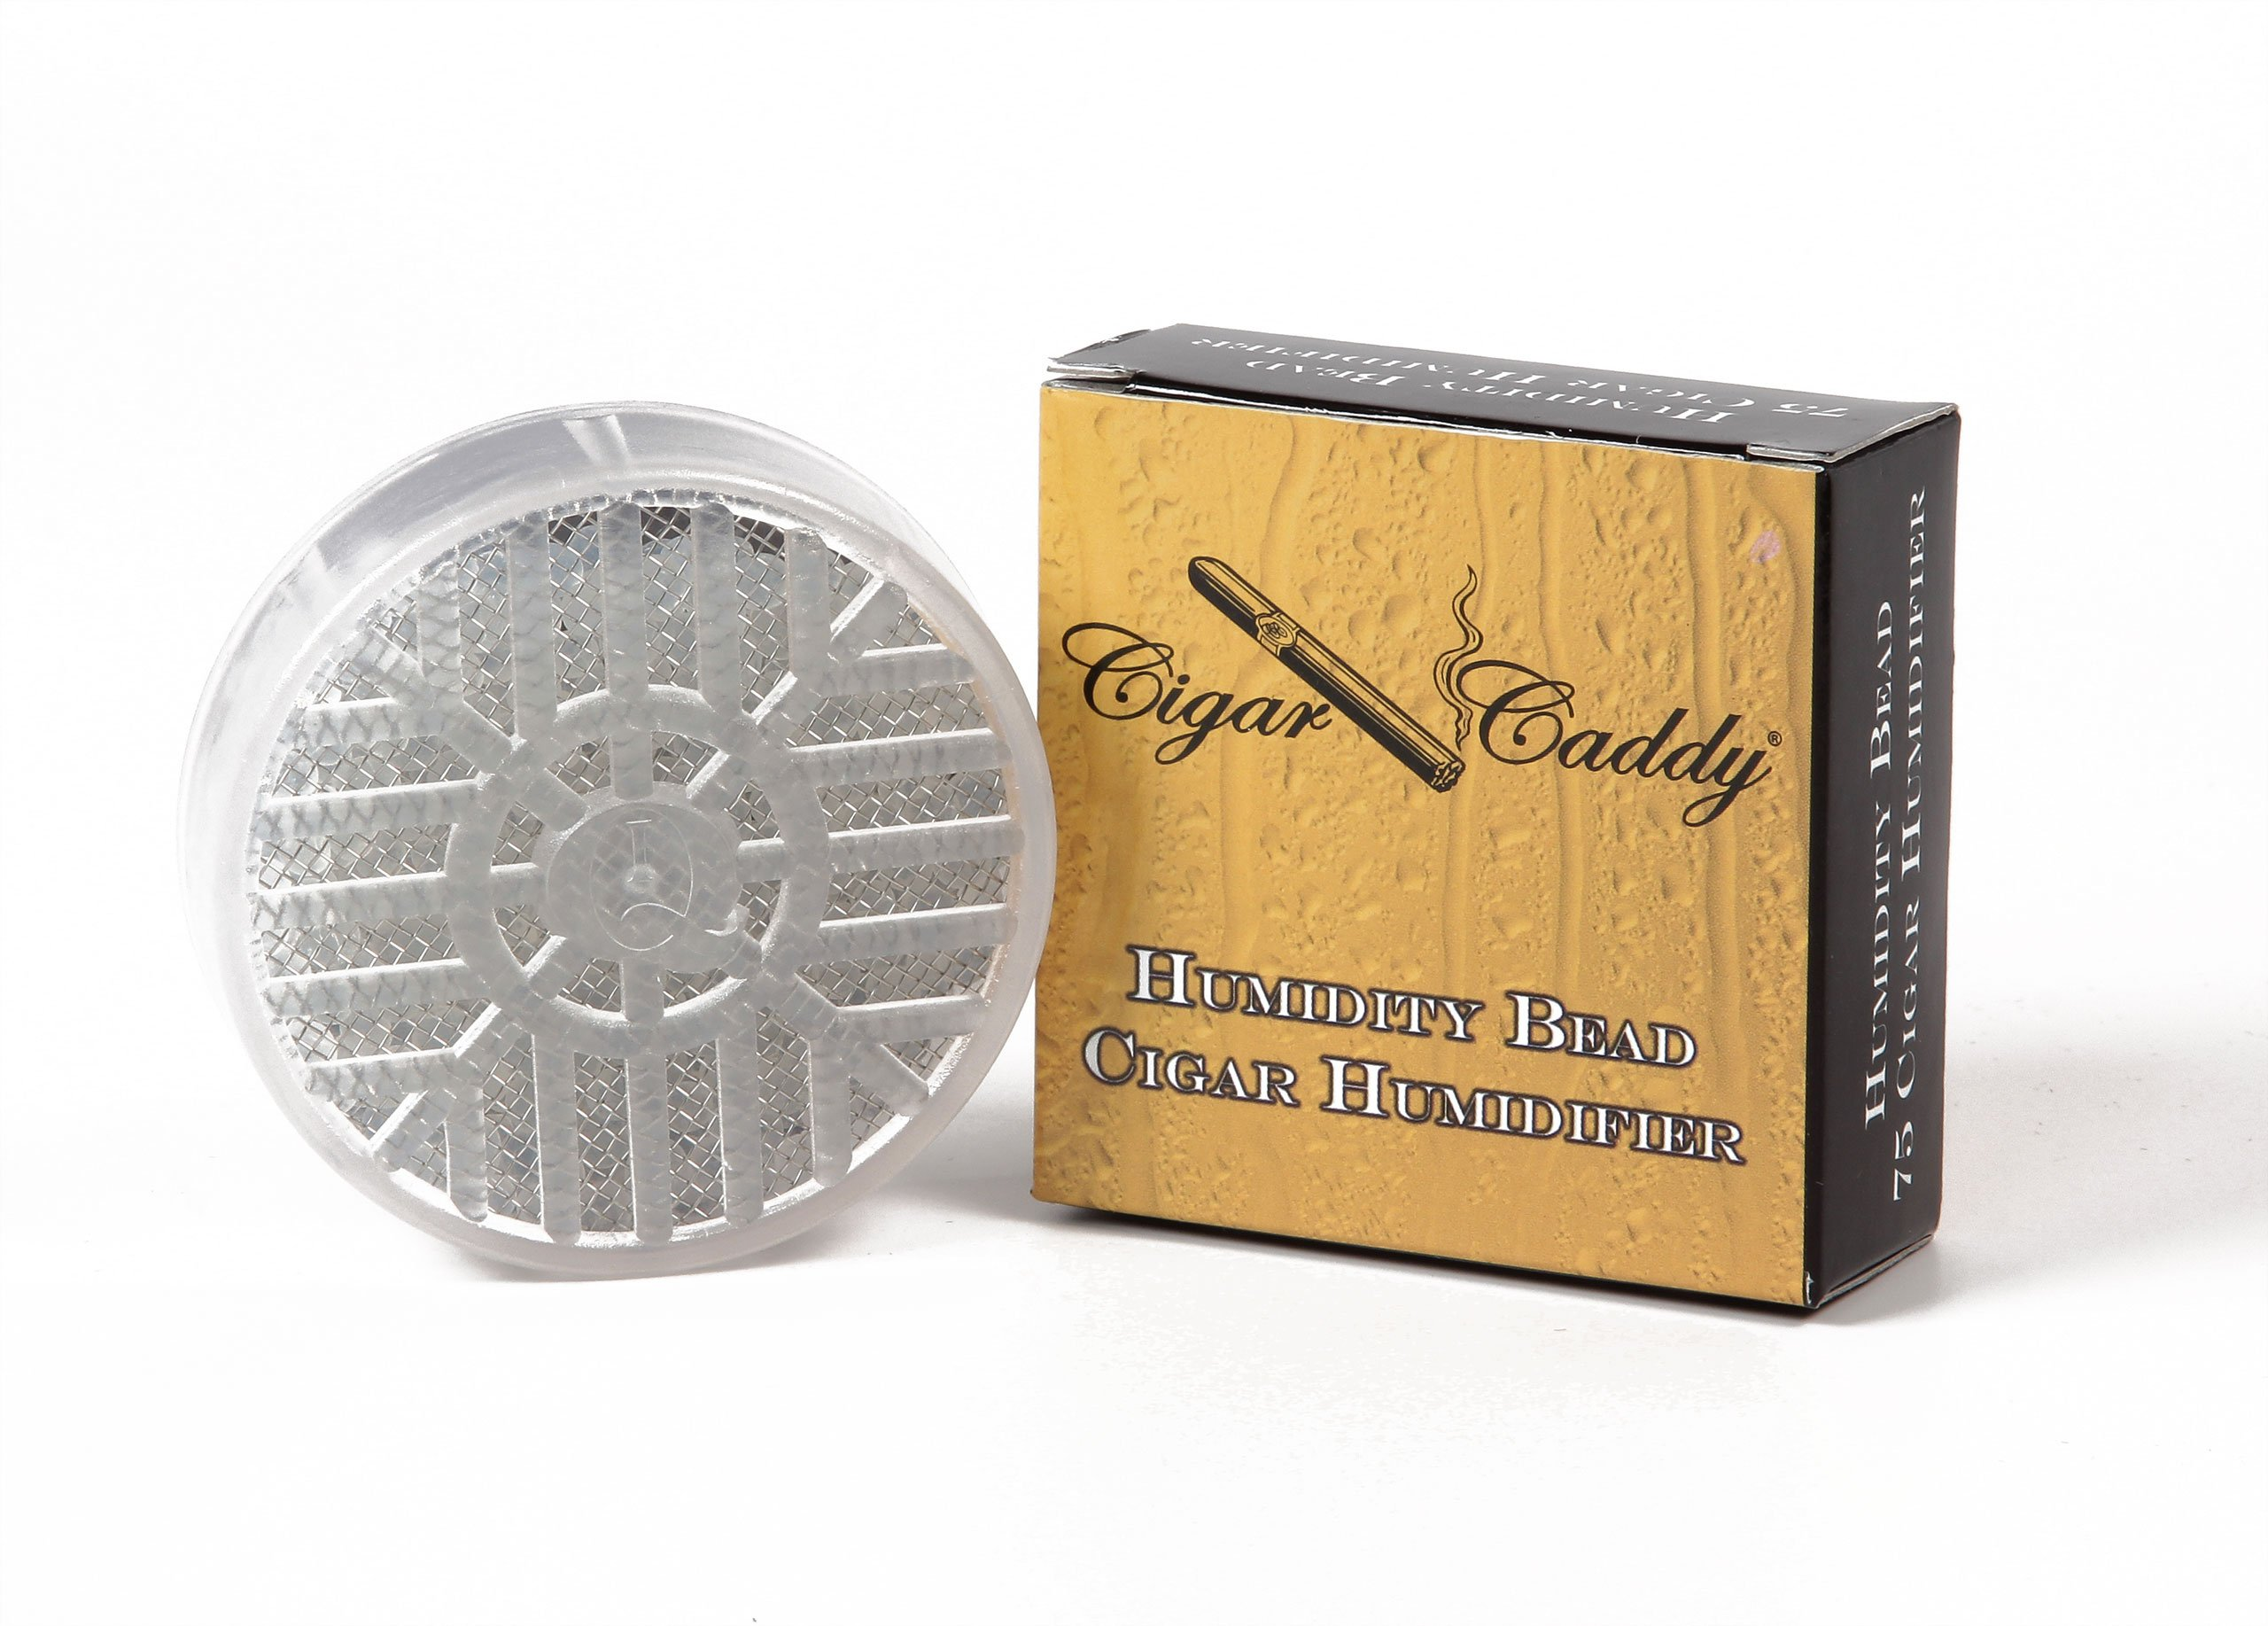 Cigar Caddy Humidity Bead Cigar Humidifier by Cigar Caddy